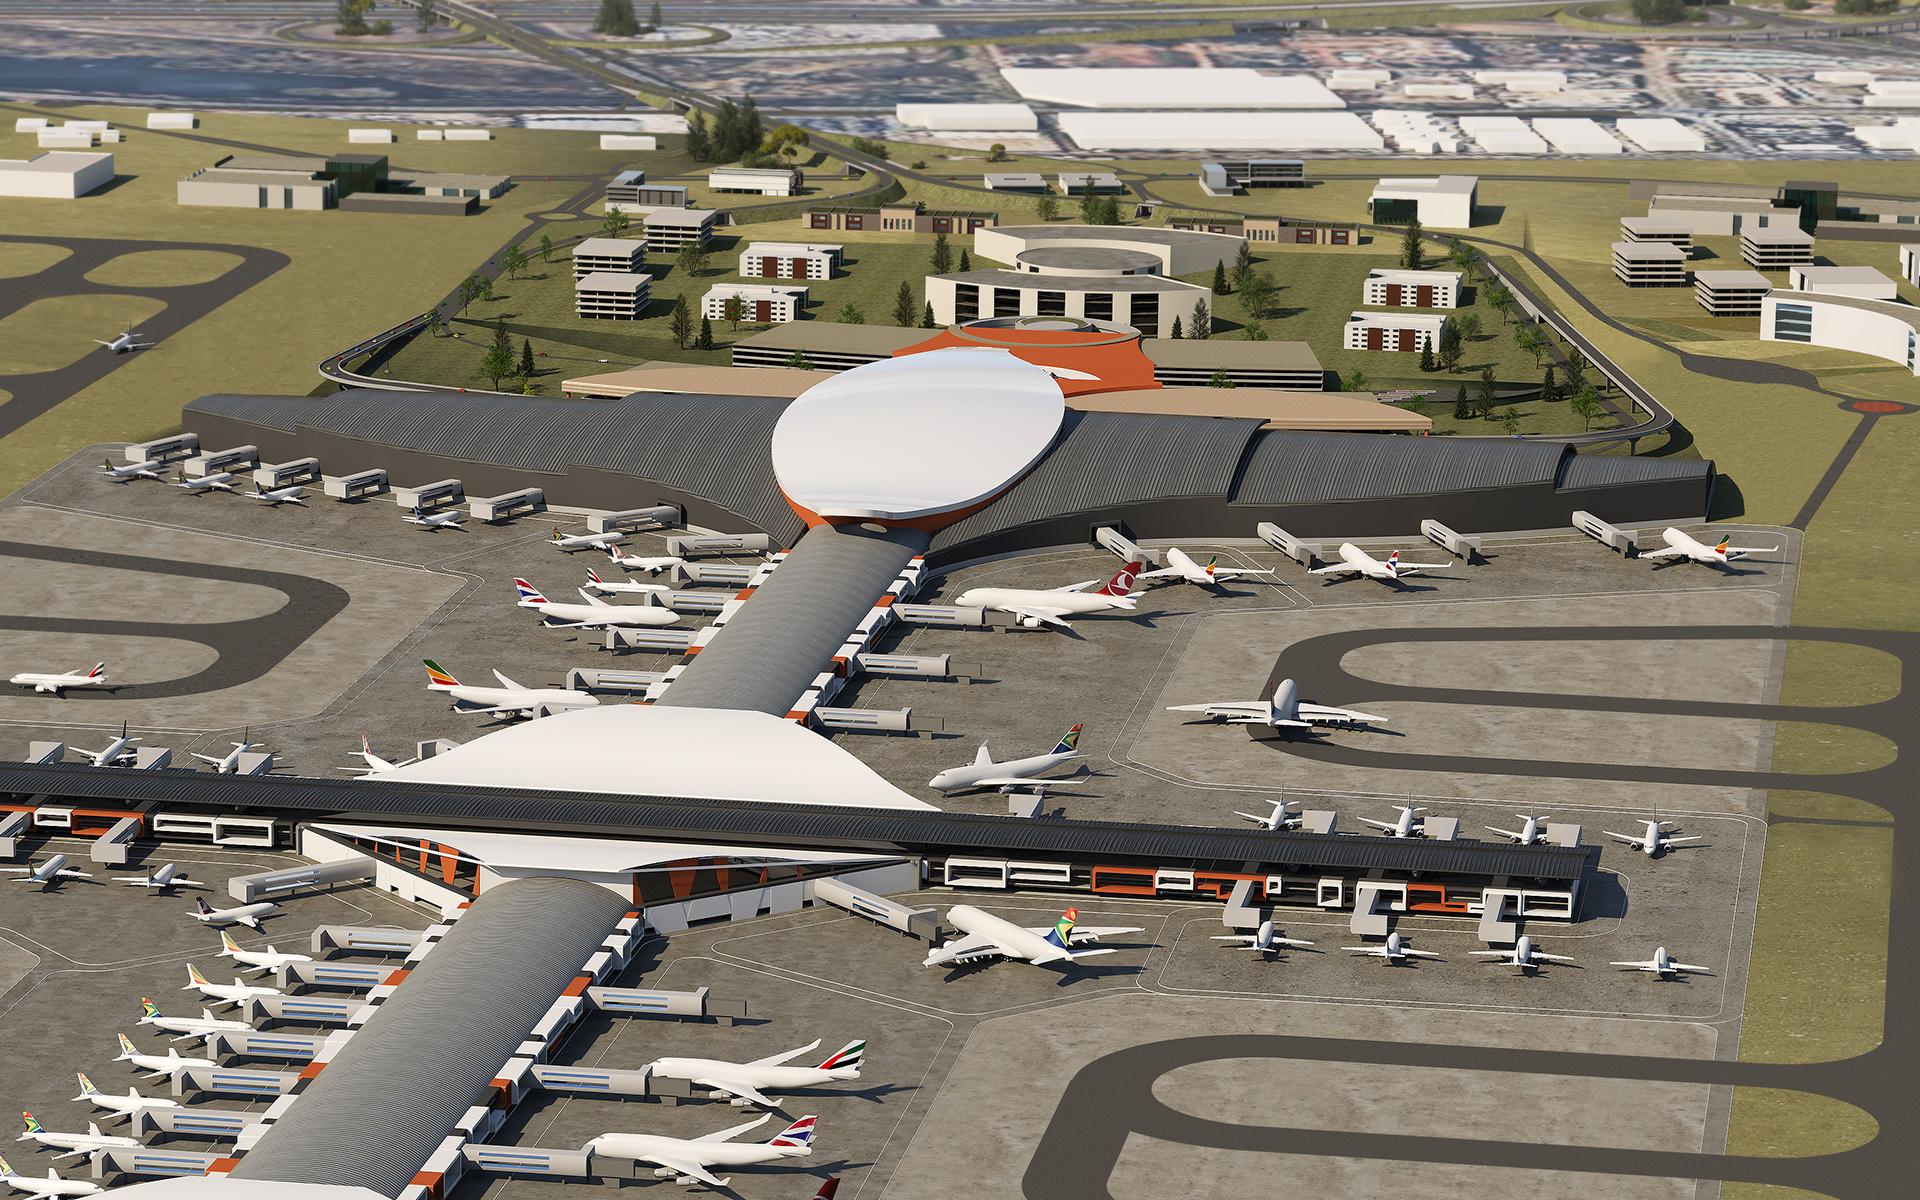 OR Tambo International Airport Master Plan